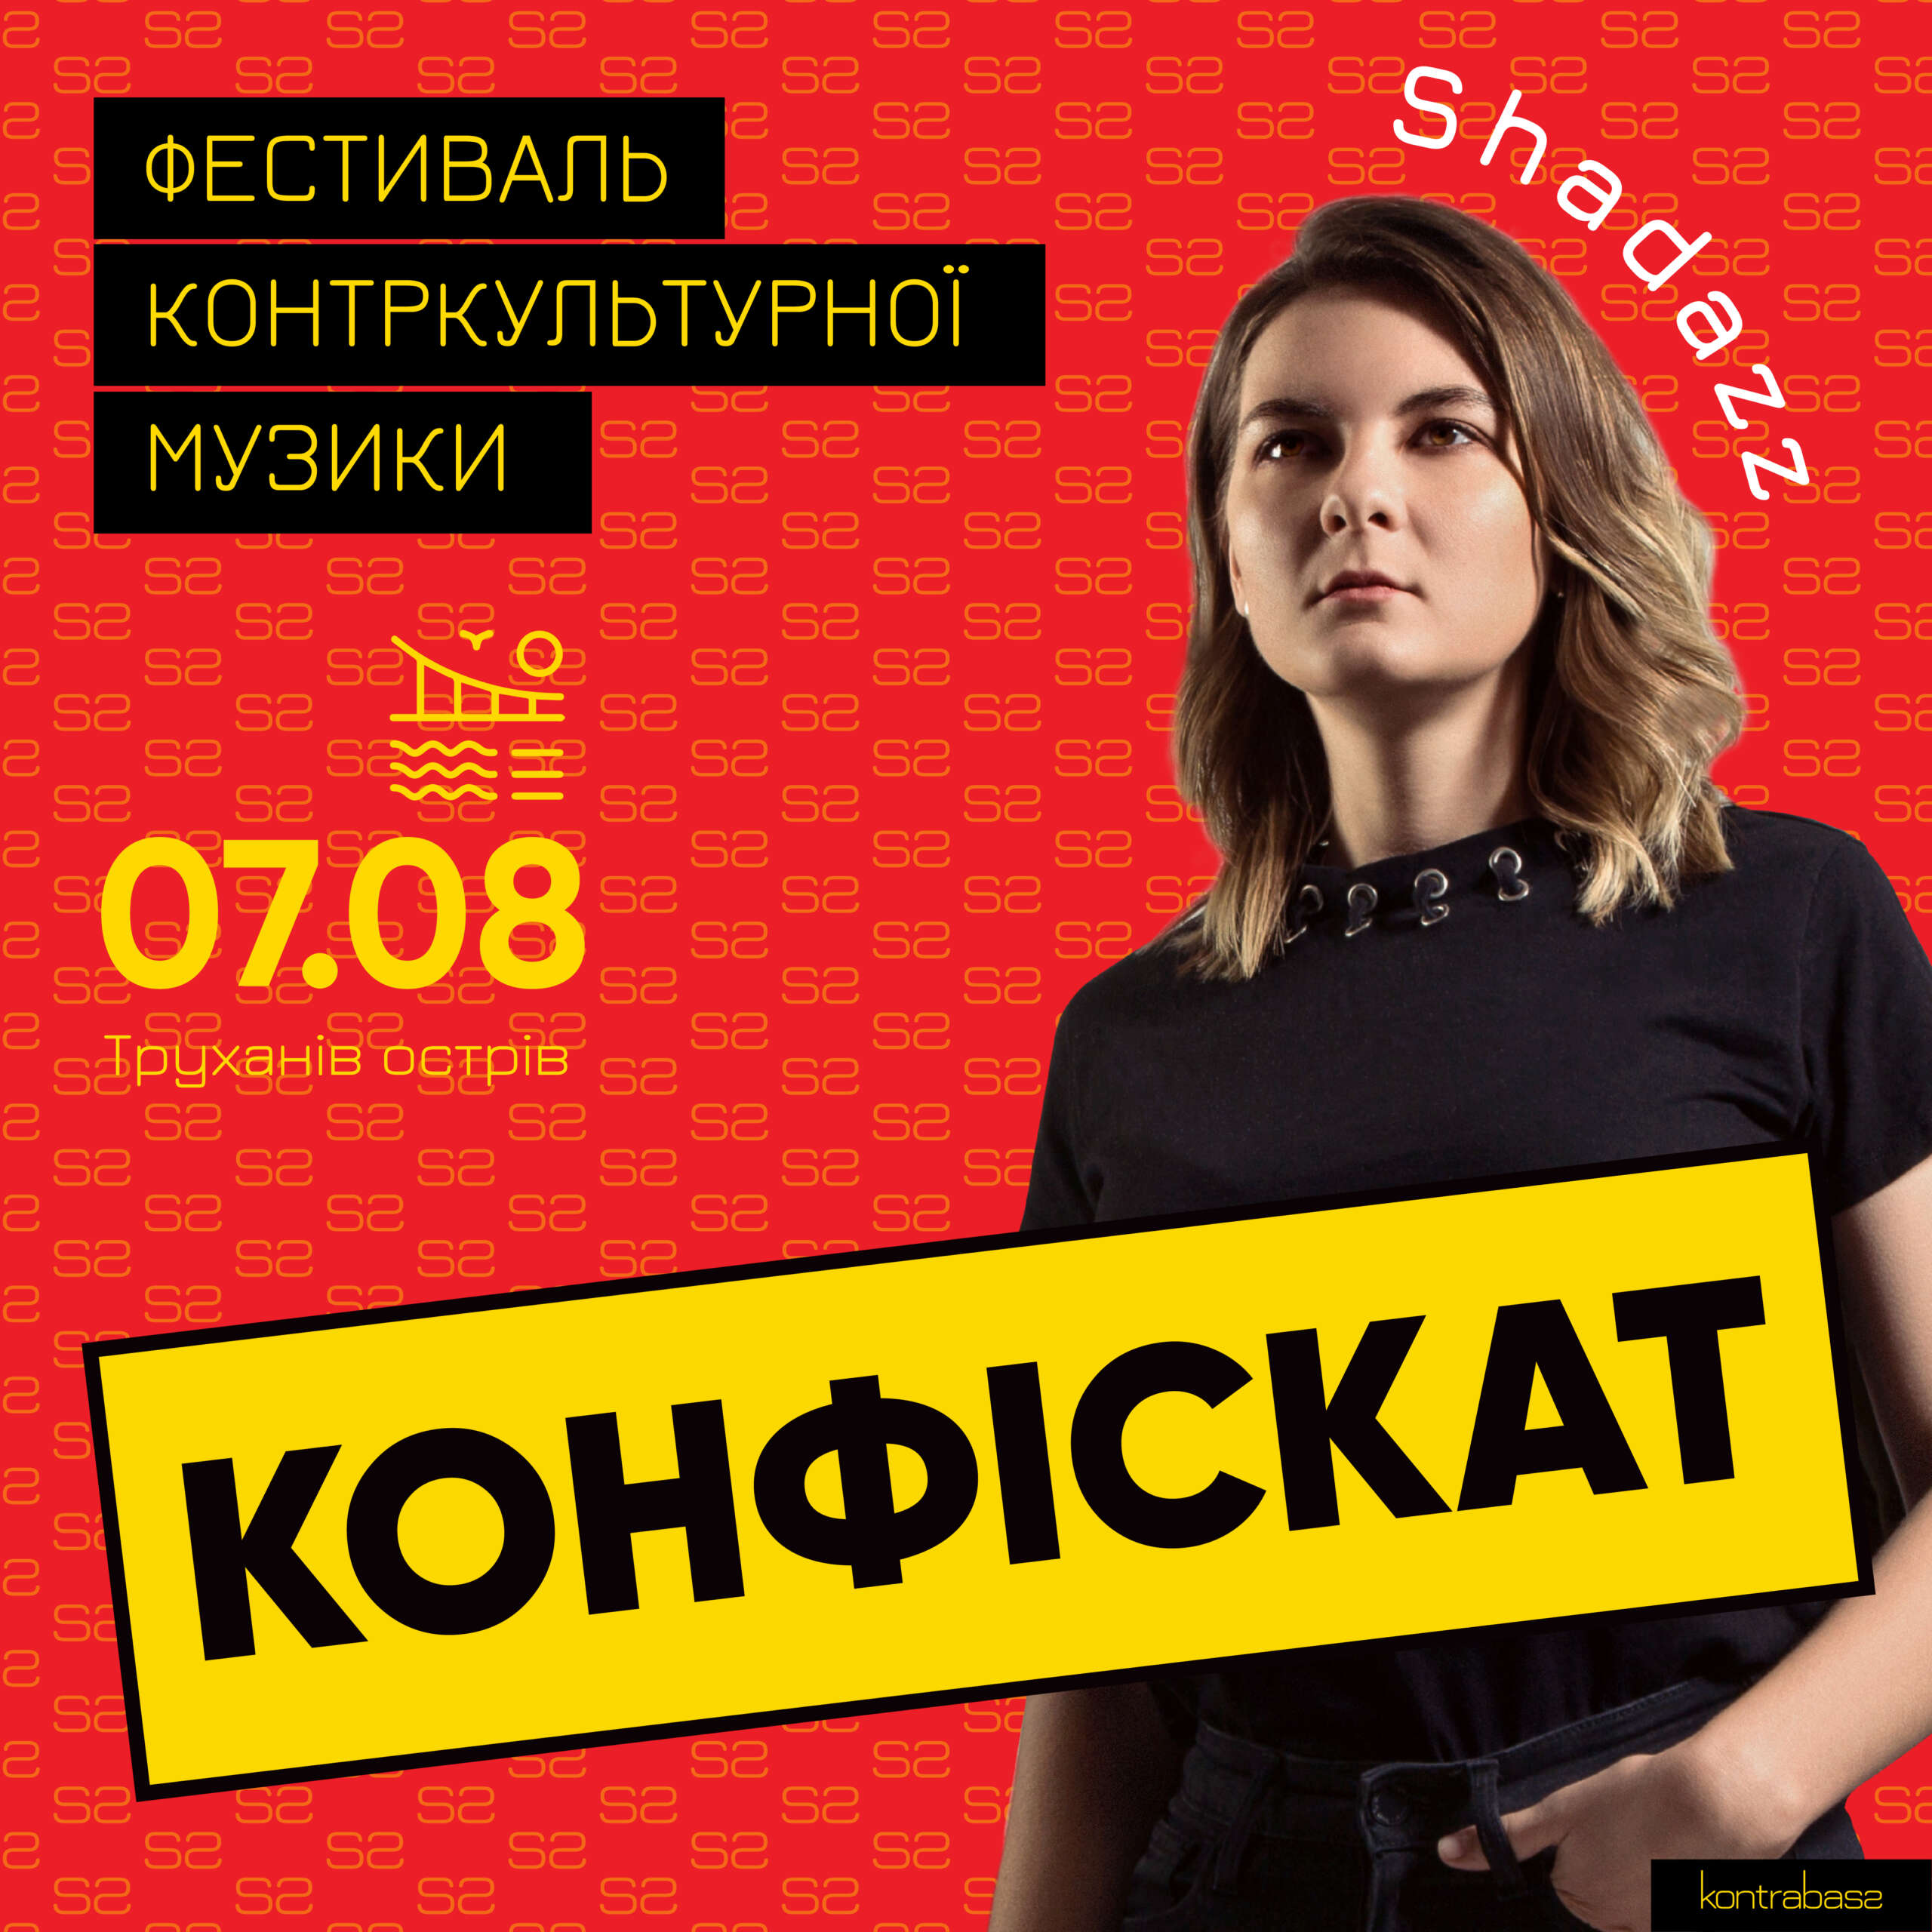 konfiskat-dtf-magazine5